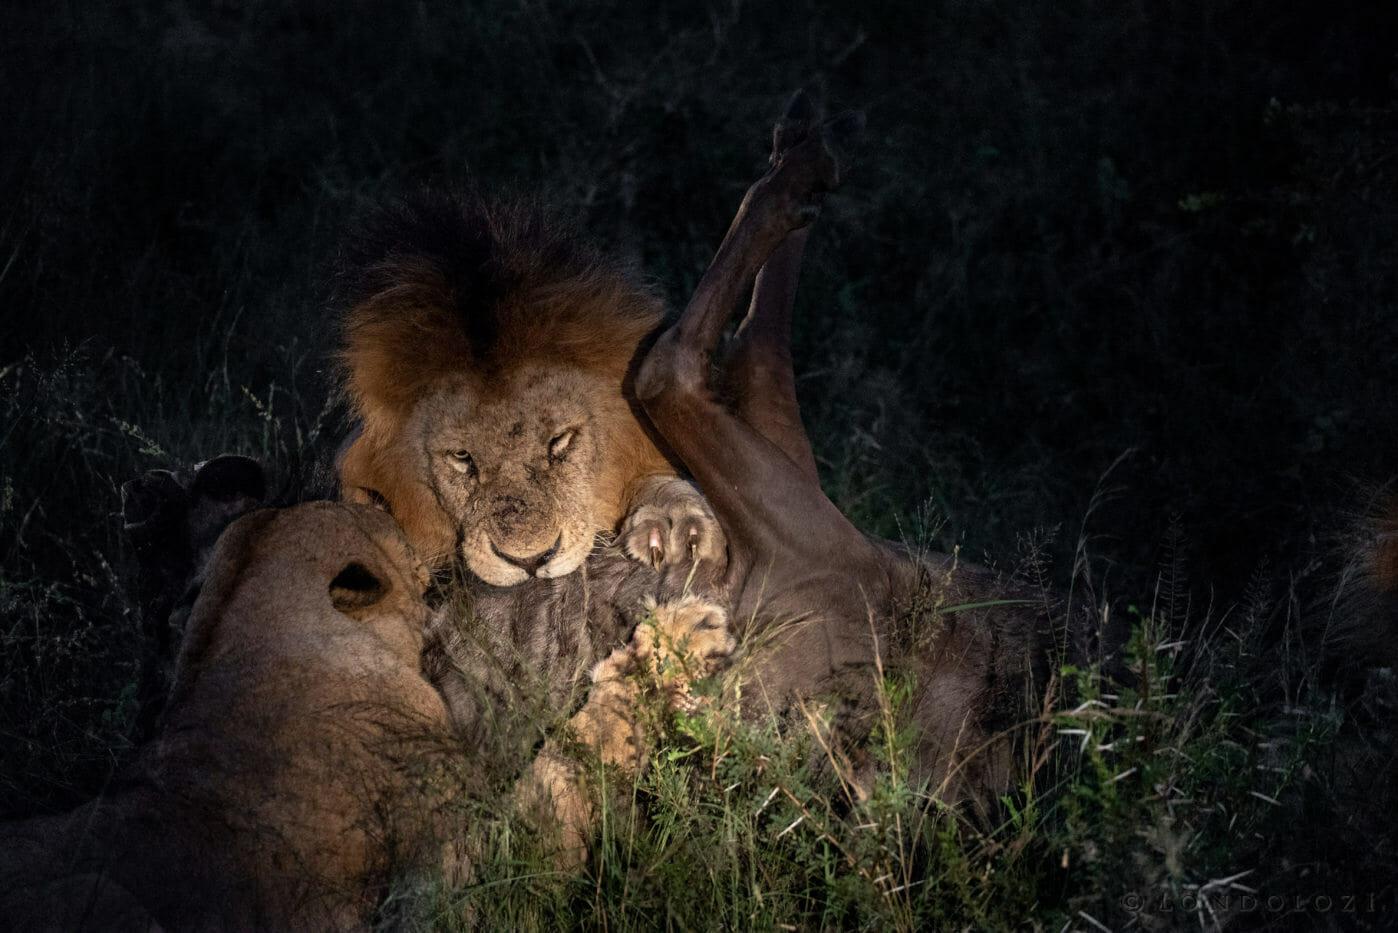 Birmingham lion wildebeest Brock Cartlidge